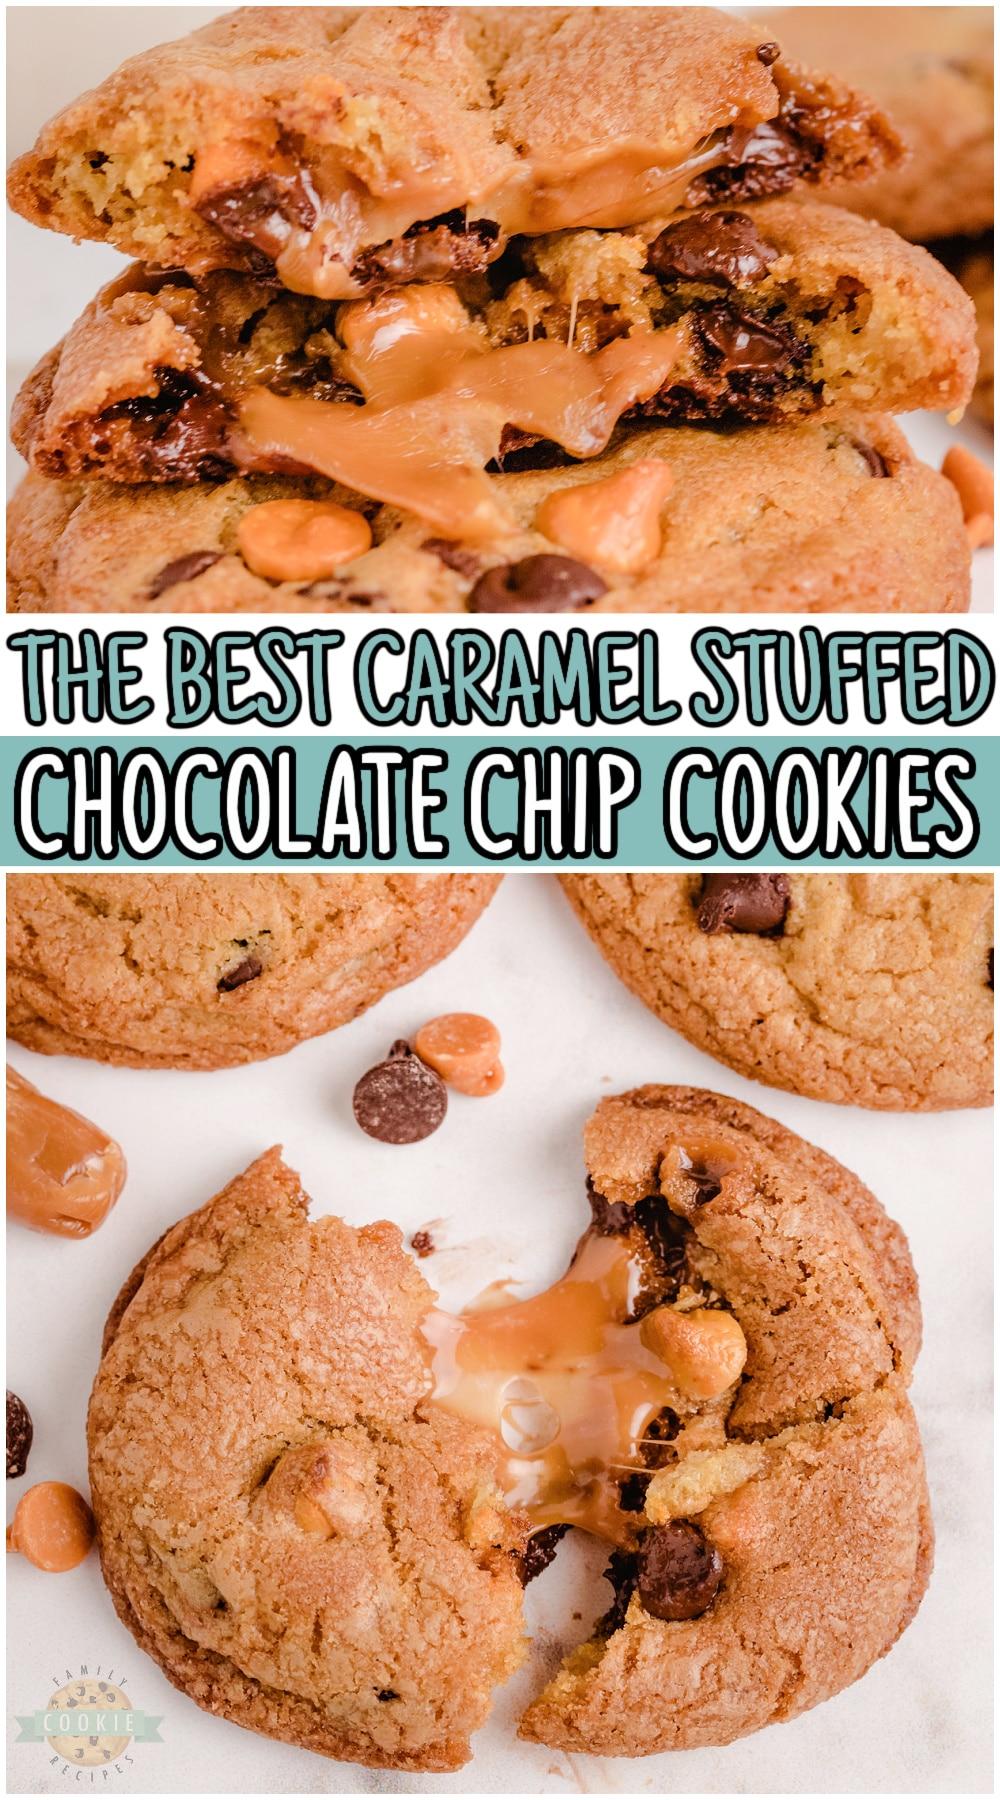 CARAMEL STUFFED CHOCOLATE CHIP COOKIES via @buttergirls